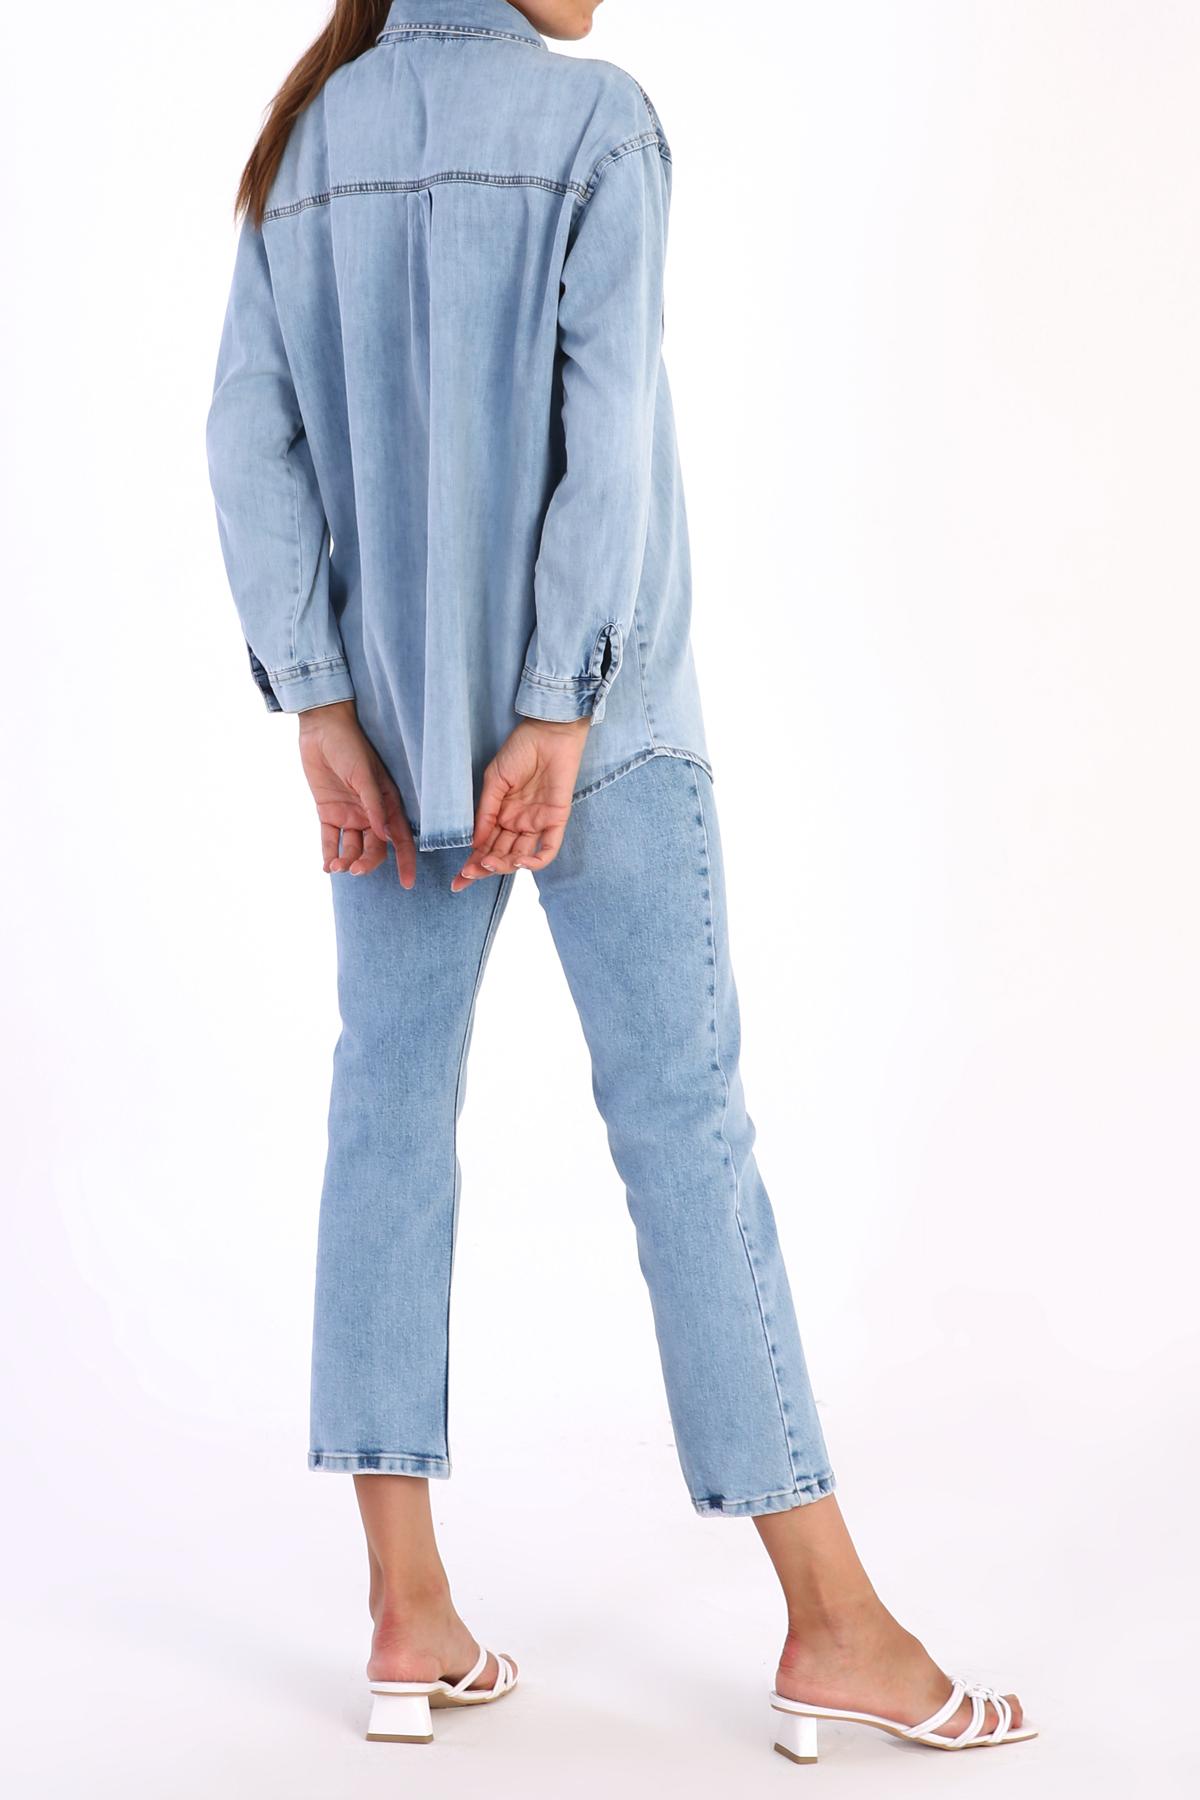 Flap Pocket Front Comfy Jean Shirt